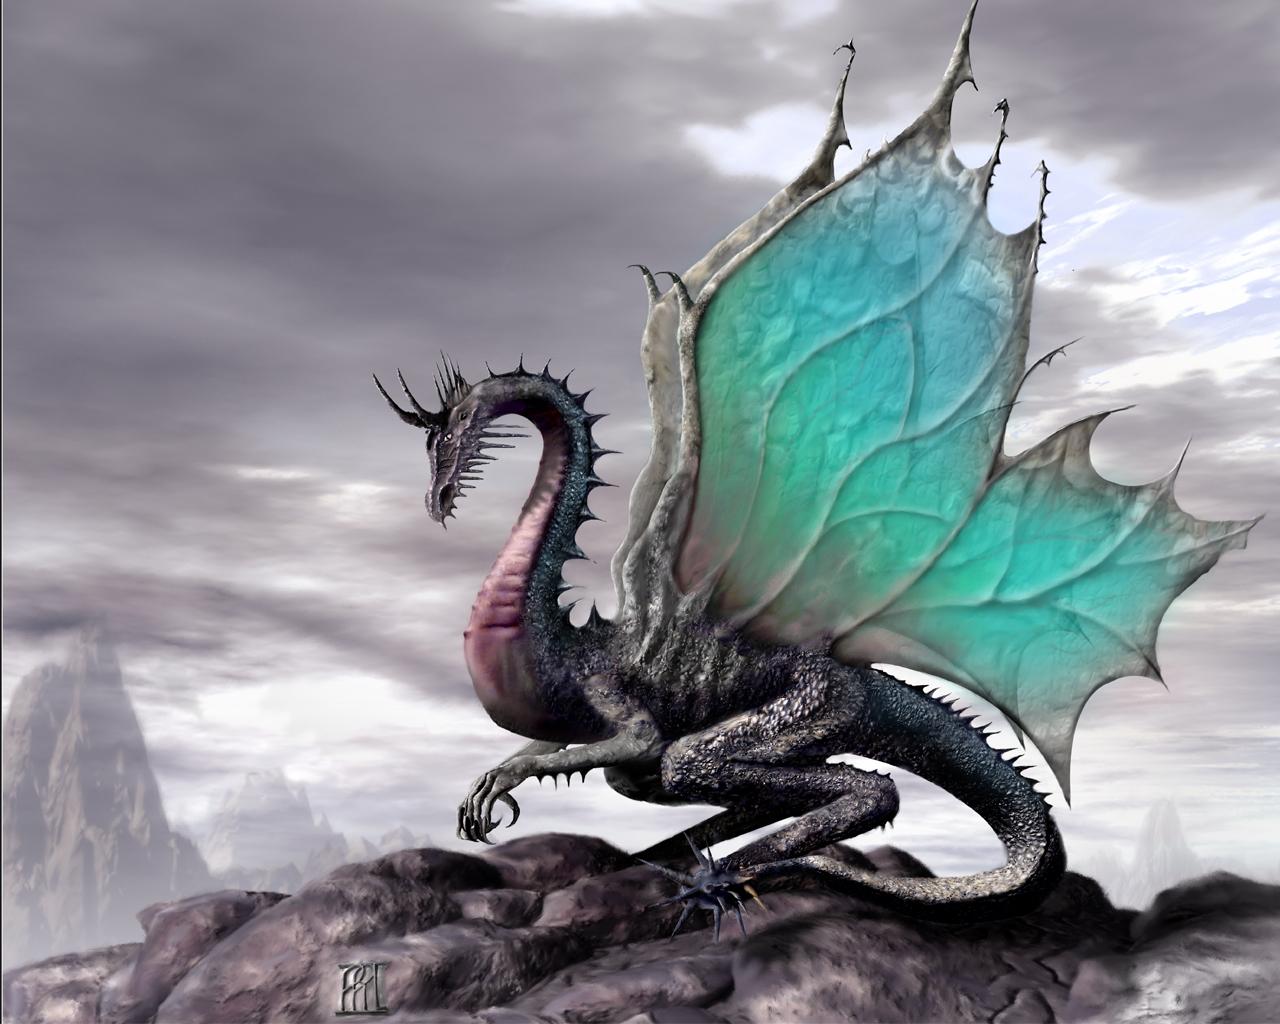 http://4.bp.blogspot.com/-cBPInGZiars/TbpKwSgrvMI/AAAAAAAAe84/xSjh0-e4GJ8/s1600/Dragon-Wallpaper-014.jpg